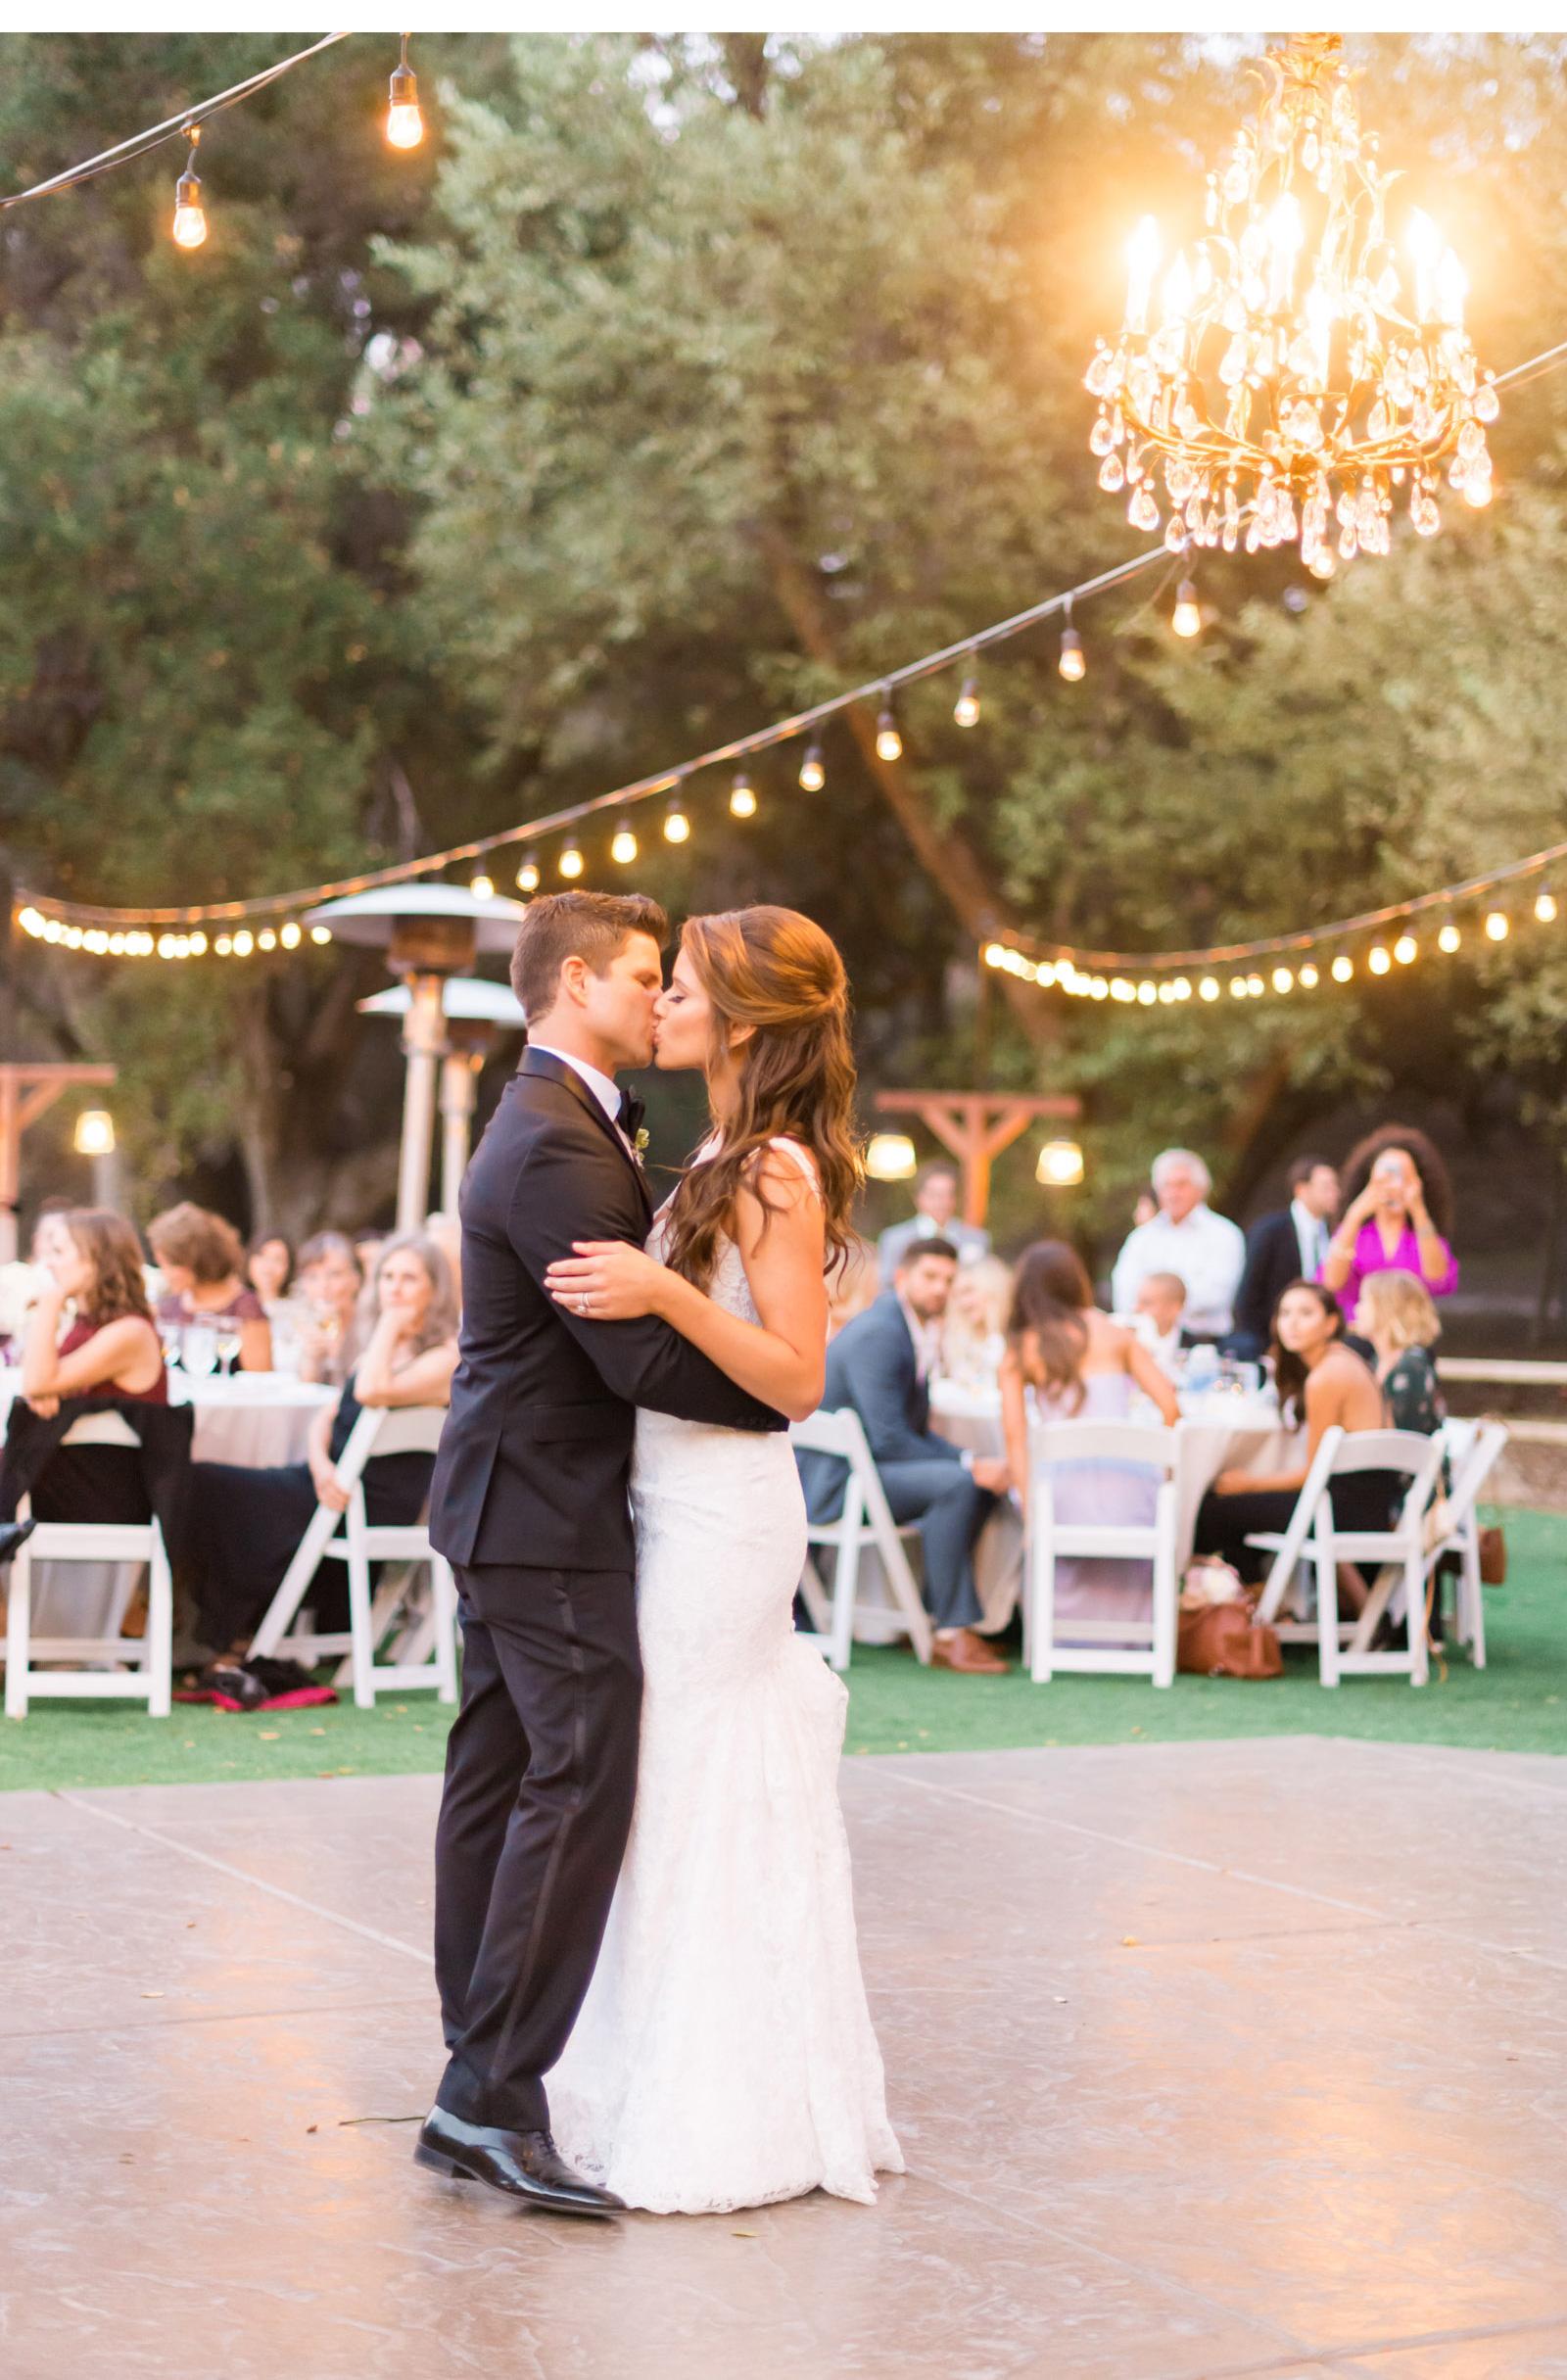 Nia-Sanchez-&-Daniel-Booko-Wedding-Natalie-Schutt-Photography_04.jpg